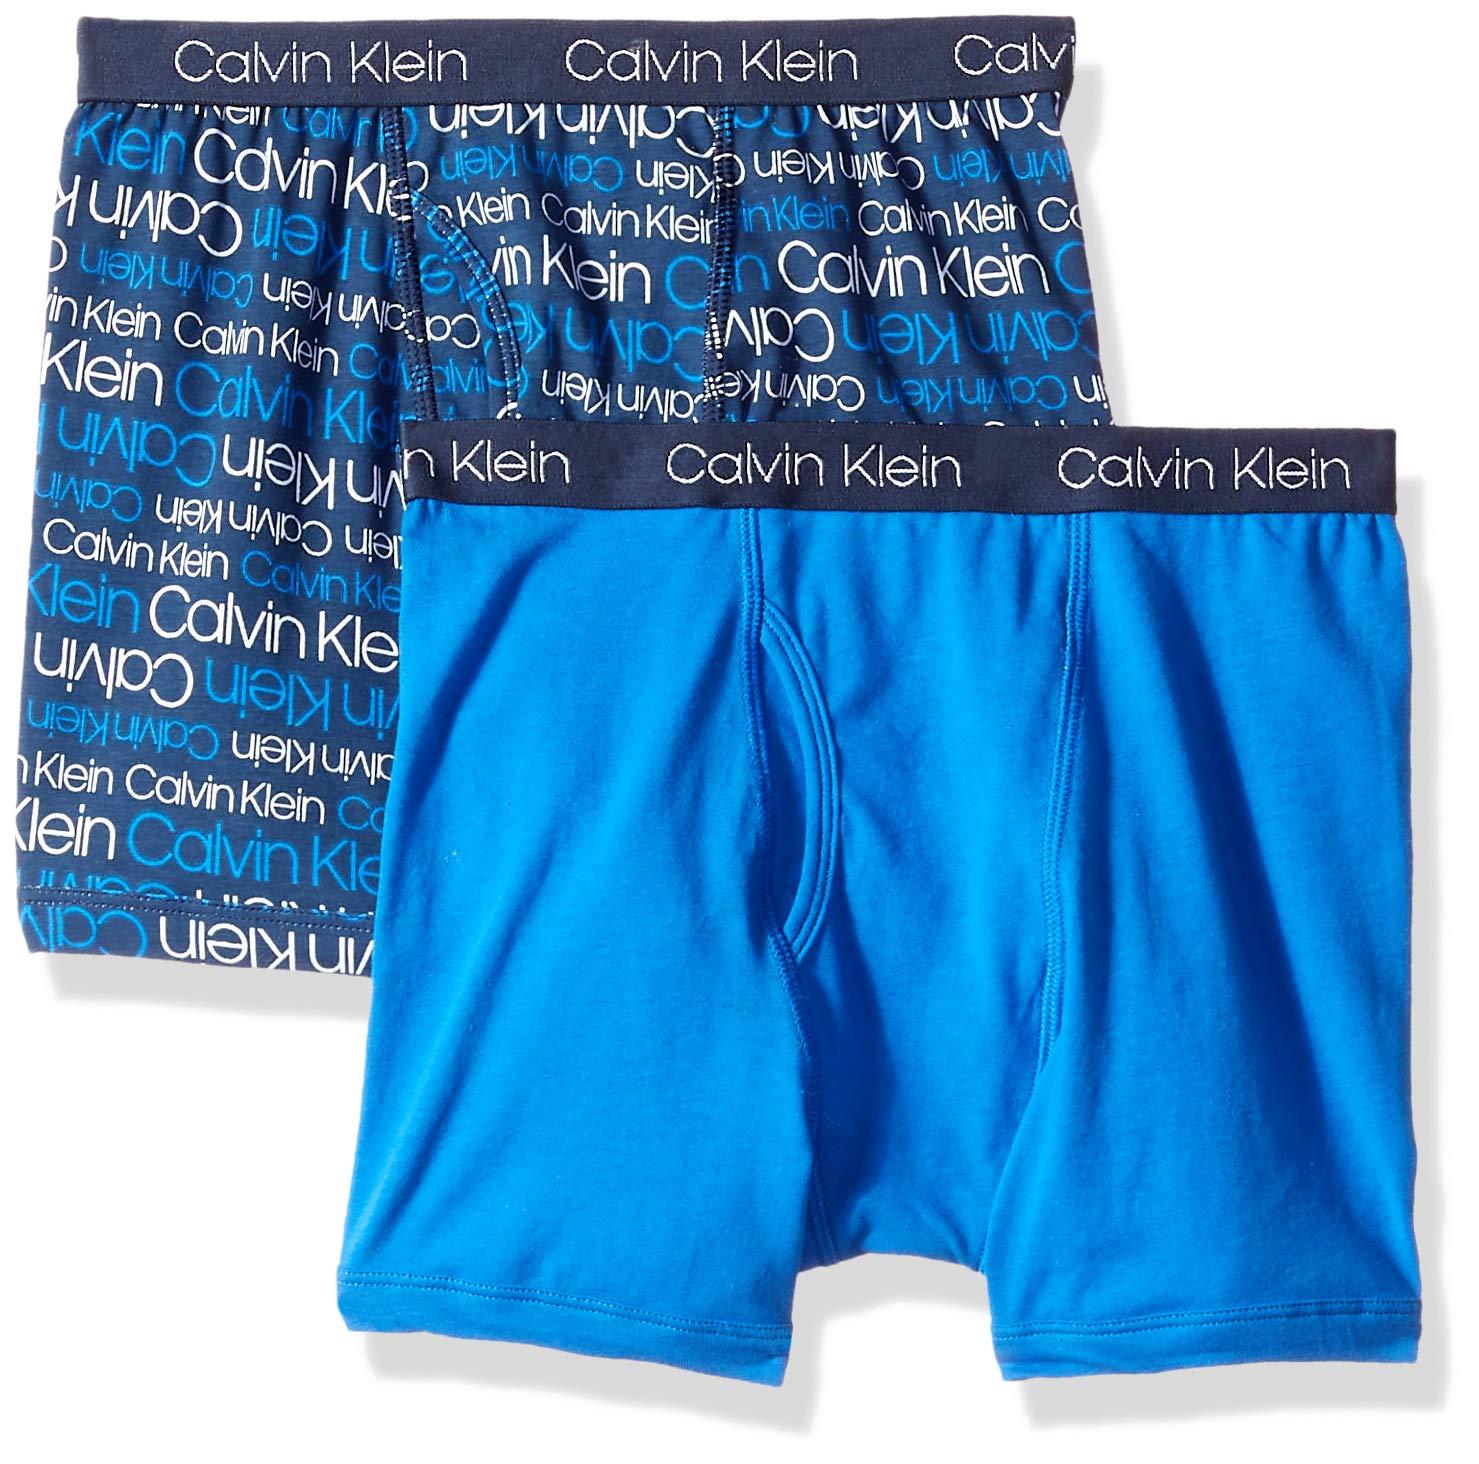 dcbef960ace Calvin Klein Little Boy's Kids Modern Cotton Assorted Boxer Briefs  Underwear, Multipack, 2 Pack-CK Logo Print Iris, Victoria Blue, X-Small /  4-5